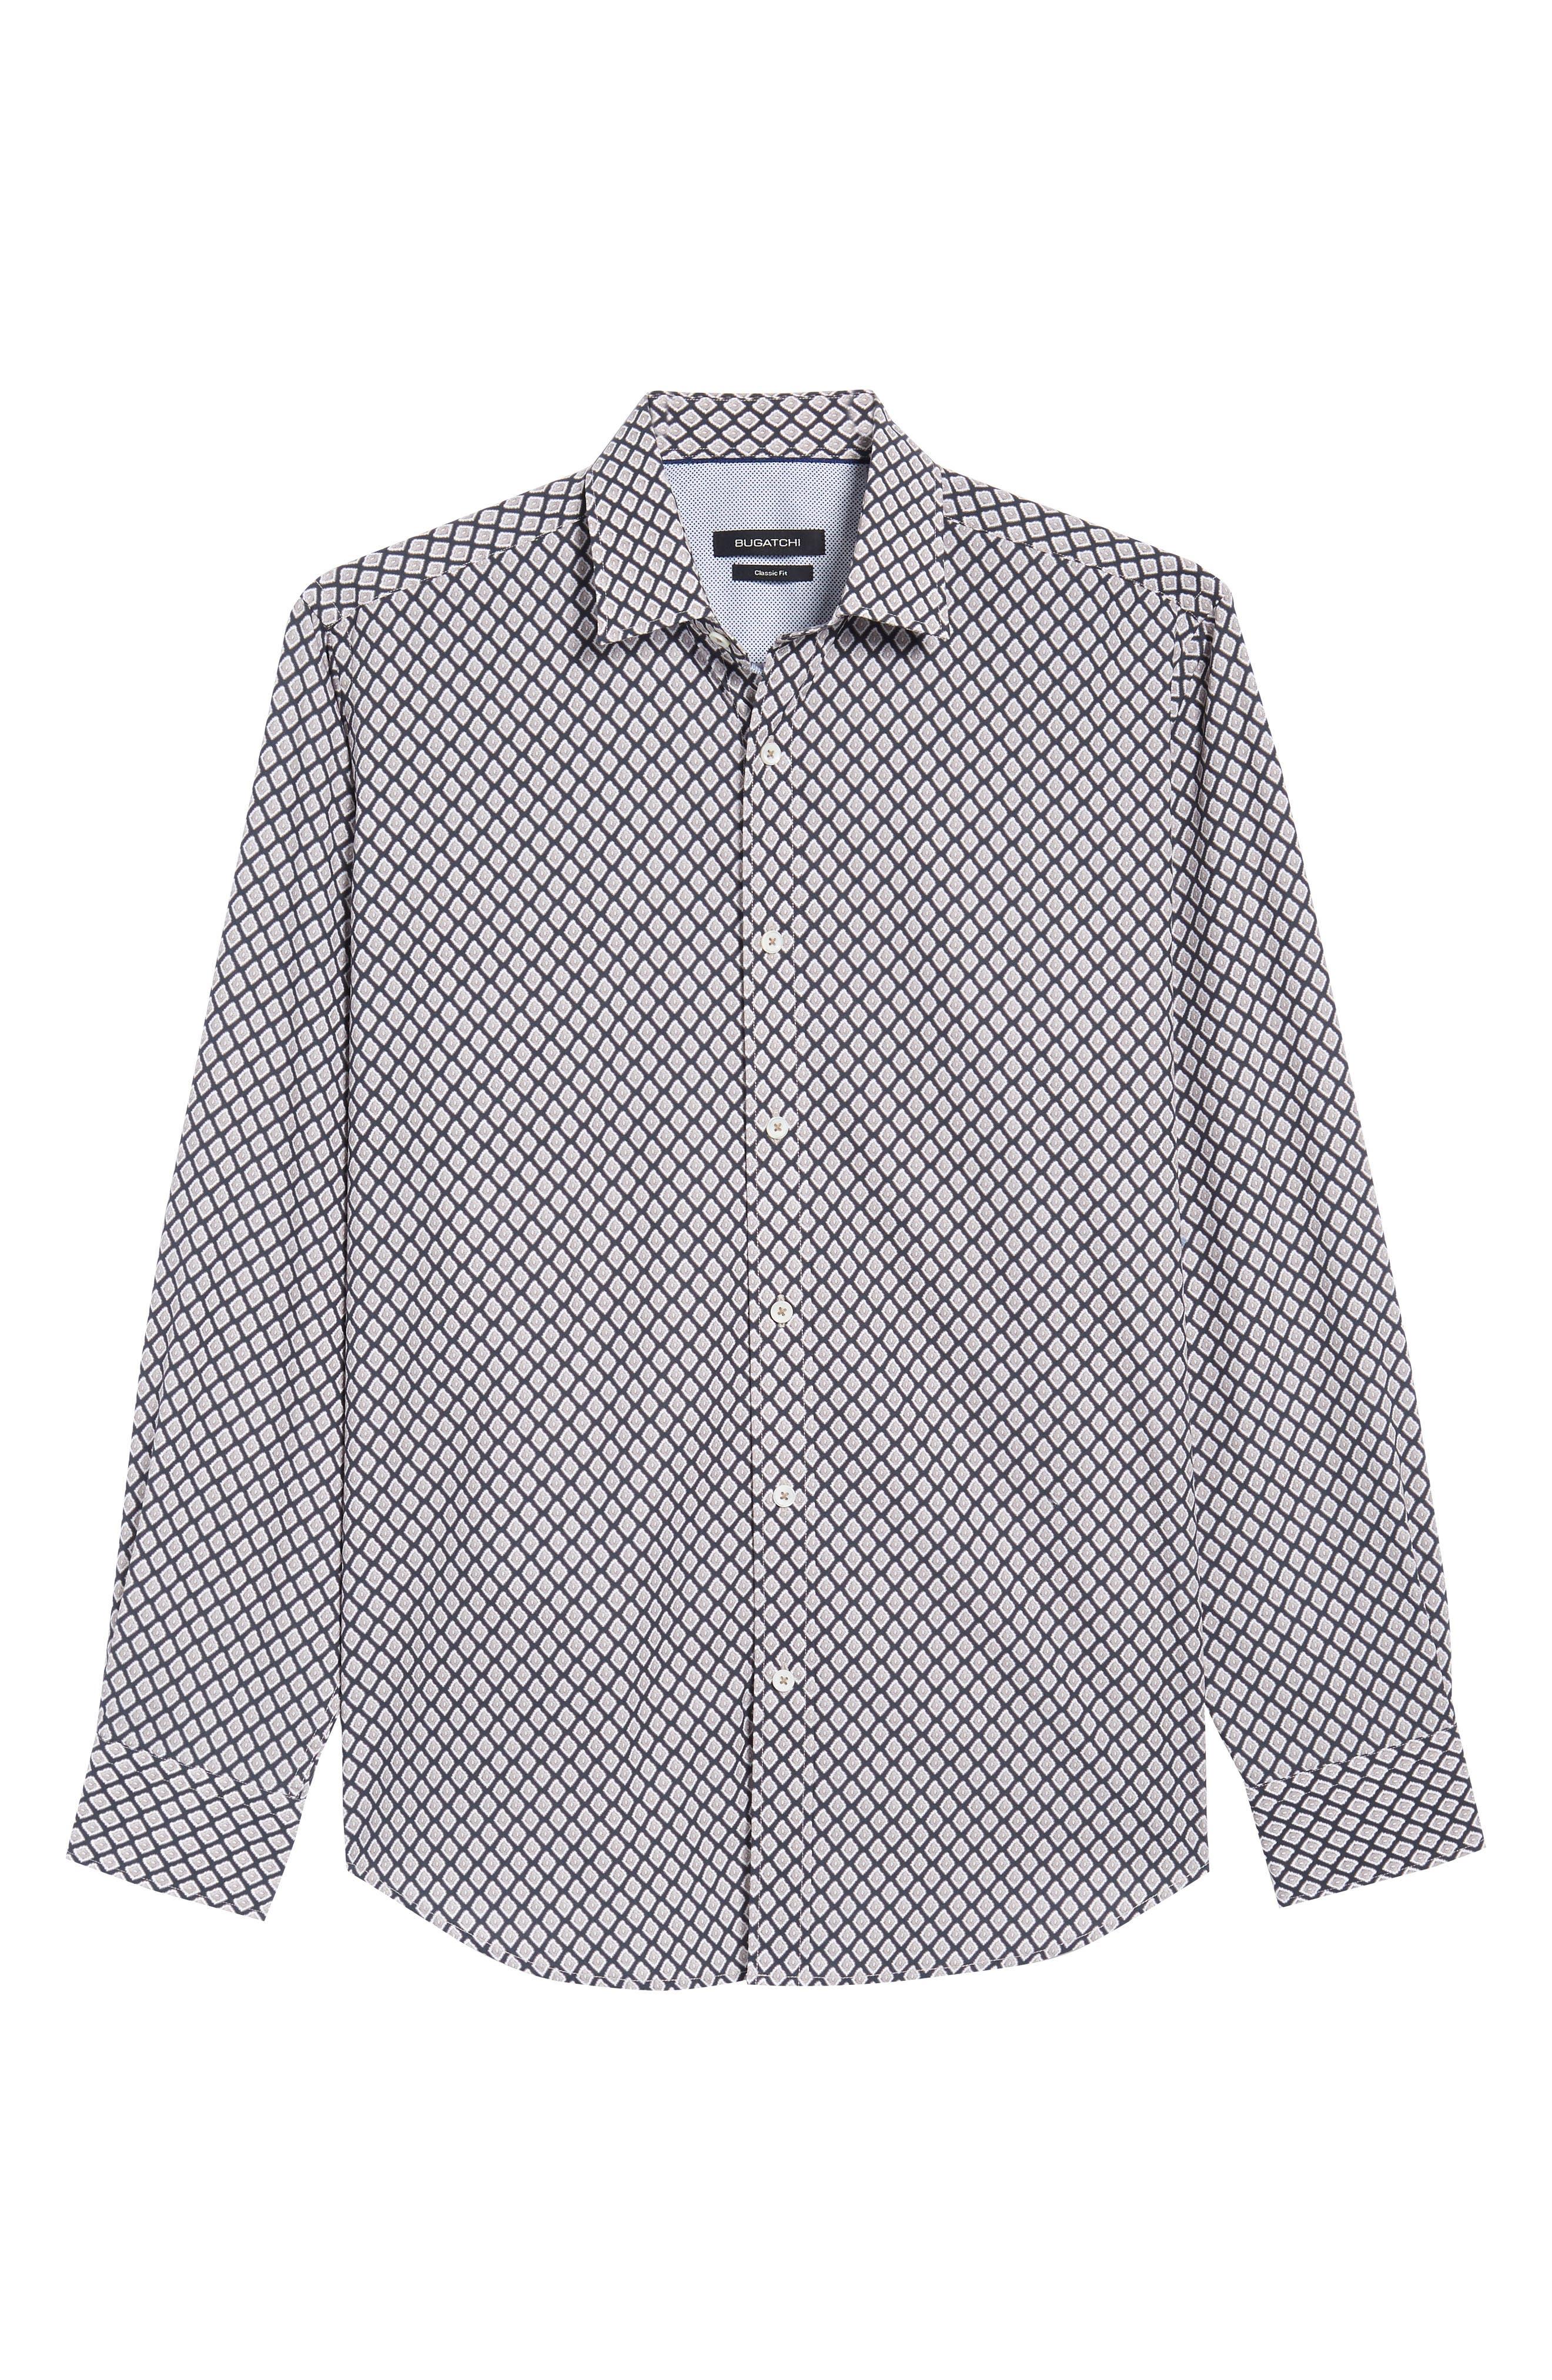 Classic Fit Woven Sport Shirt,                             Alternate thumbnail 6, color,                             271